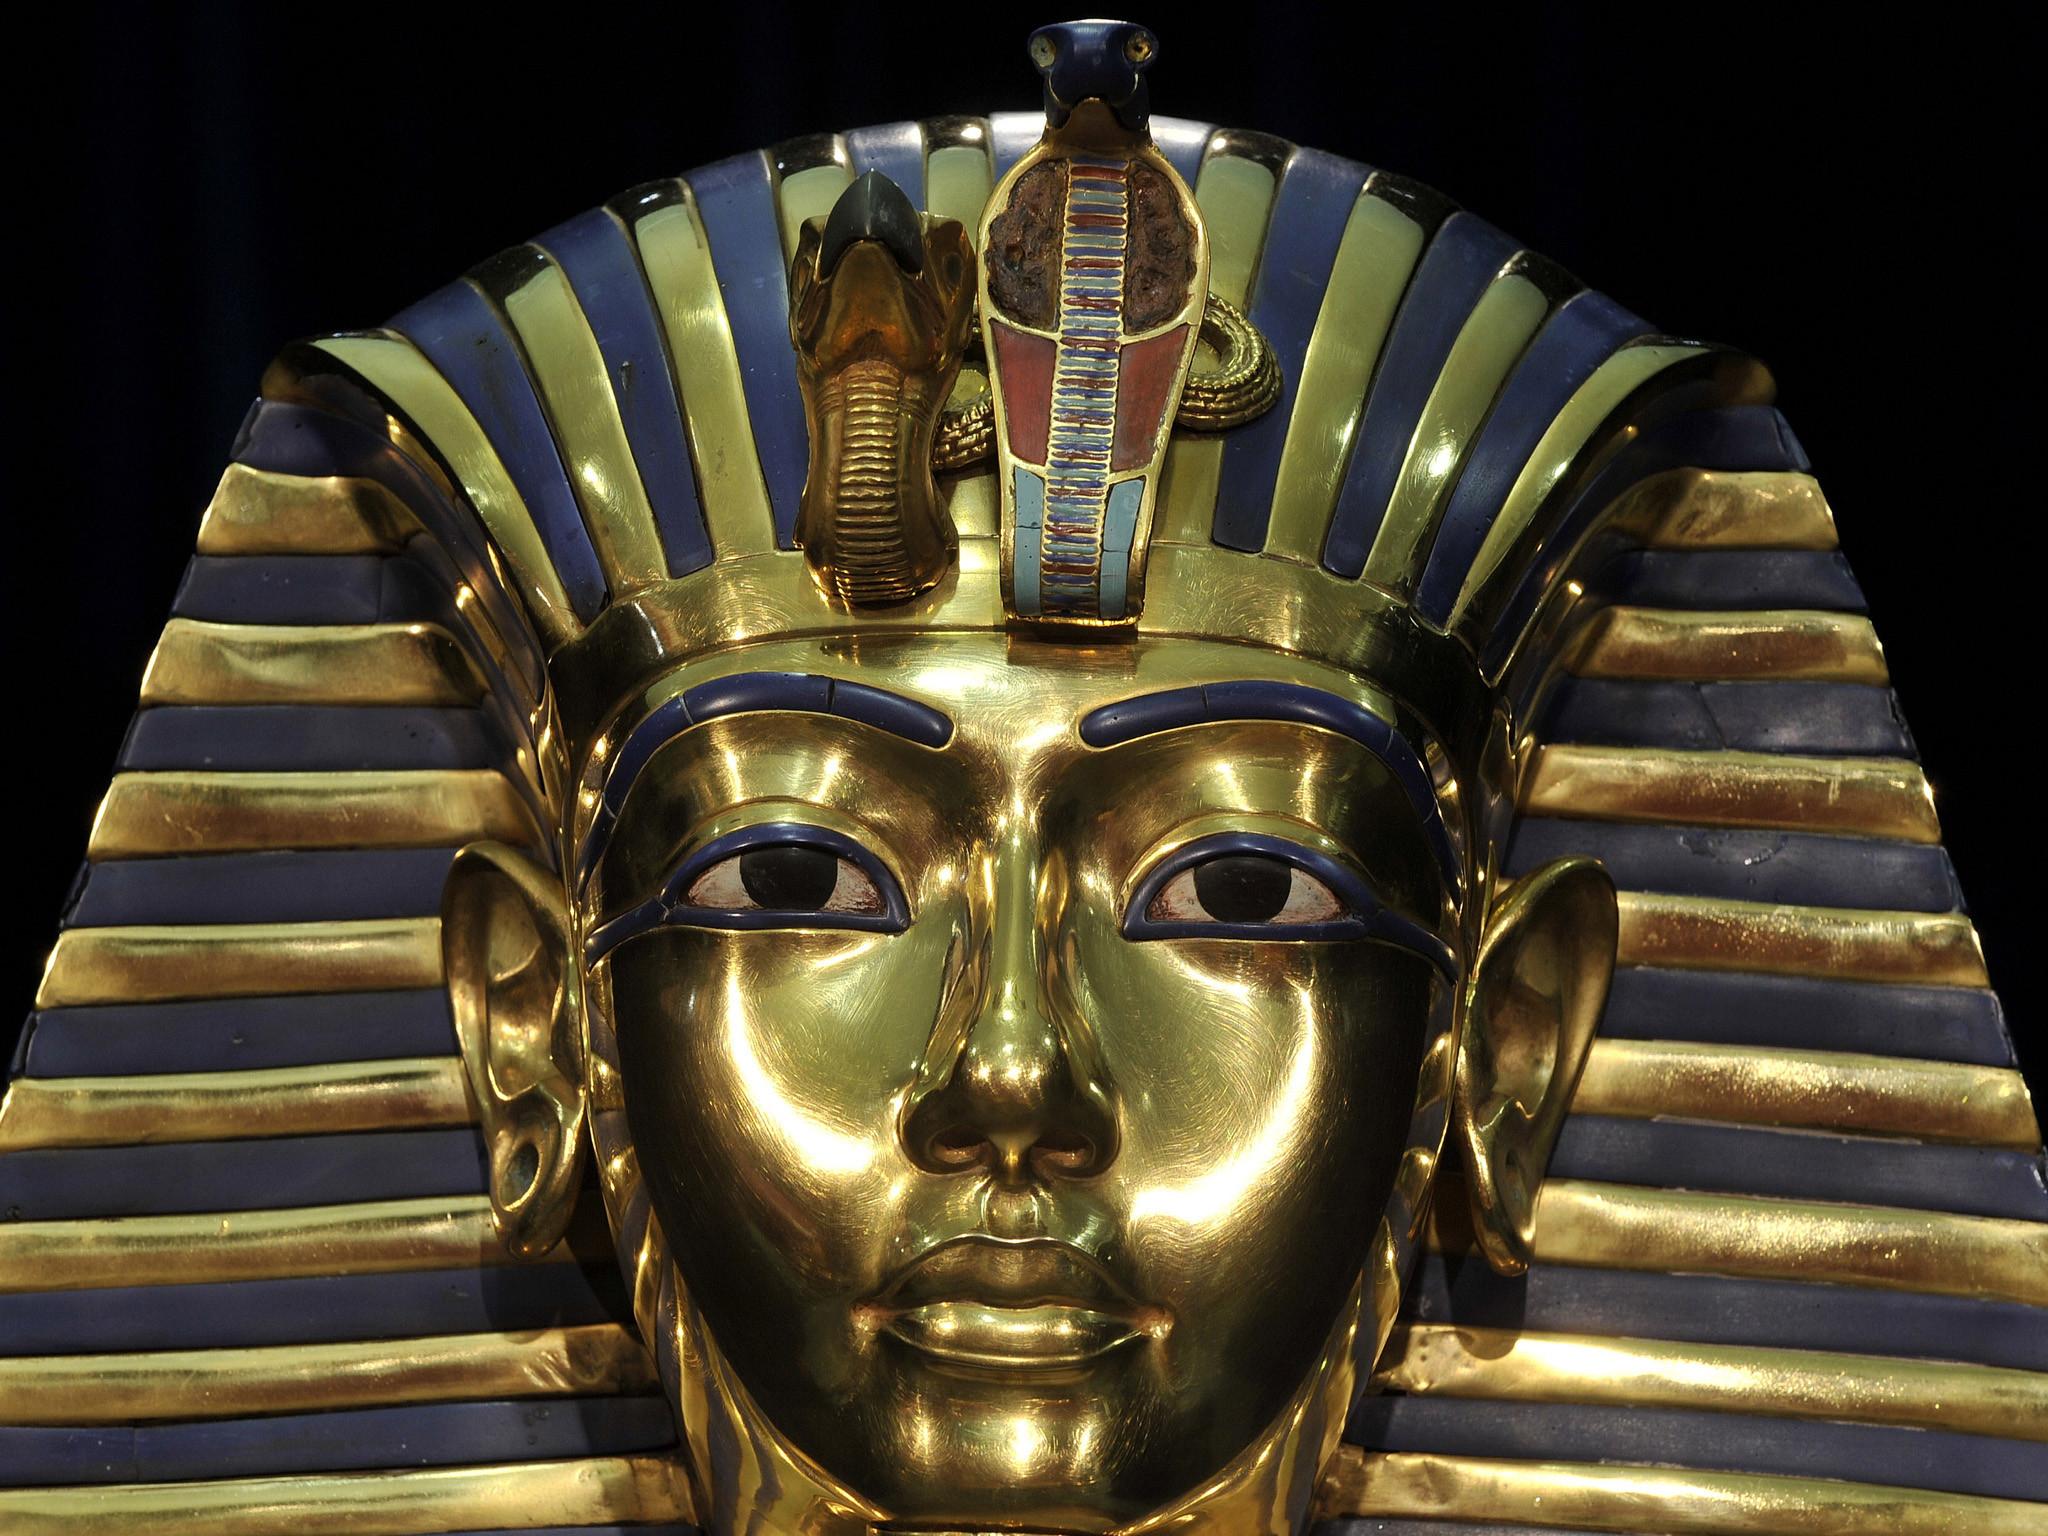 King Tutankhamun was mummified with an erect penis to 'quash religious  revolution' | The Independent